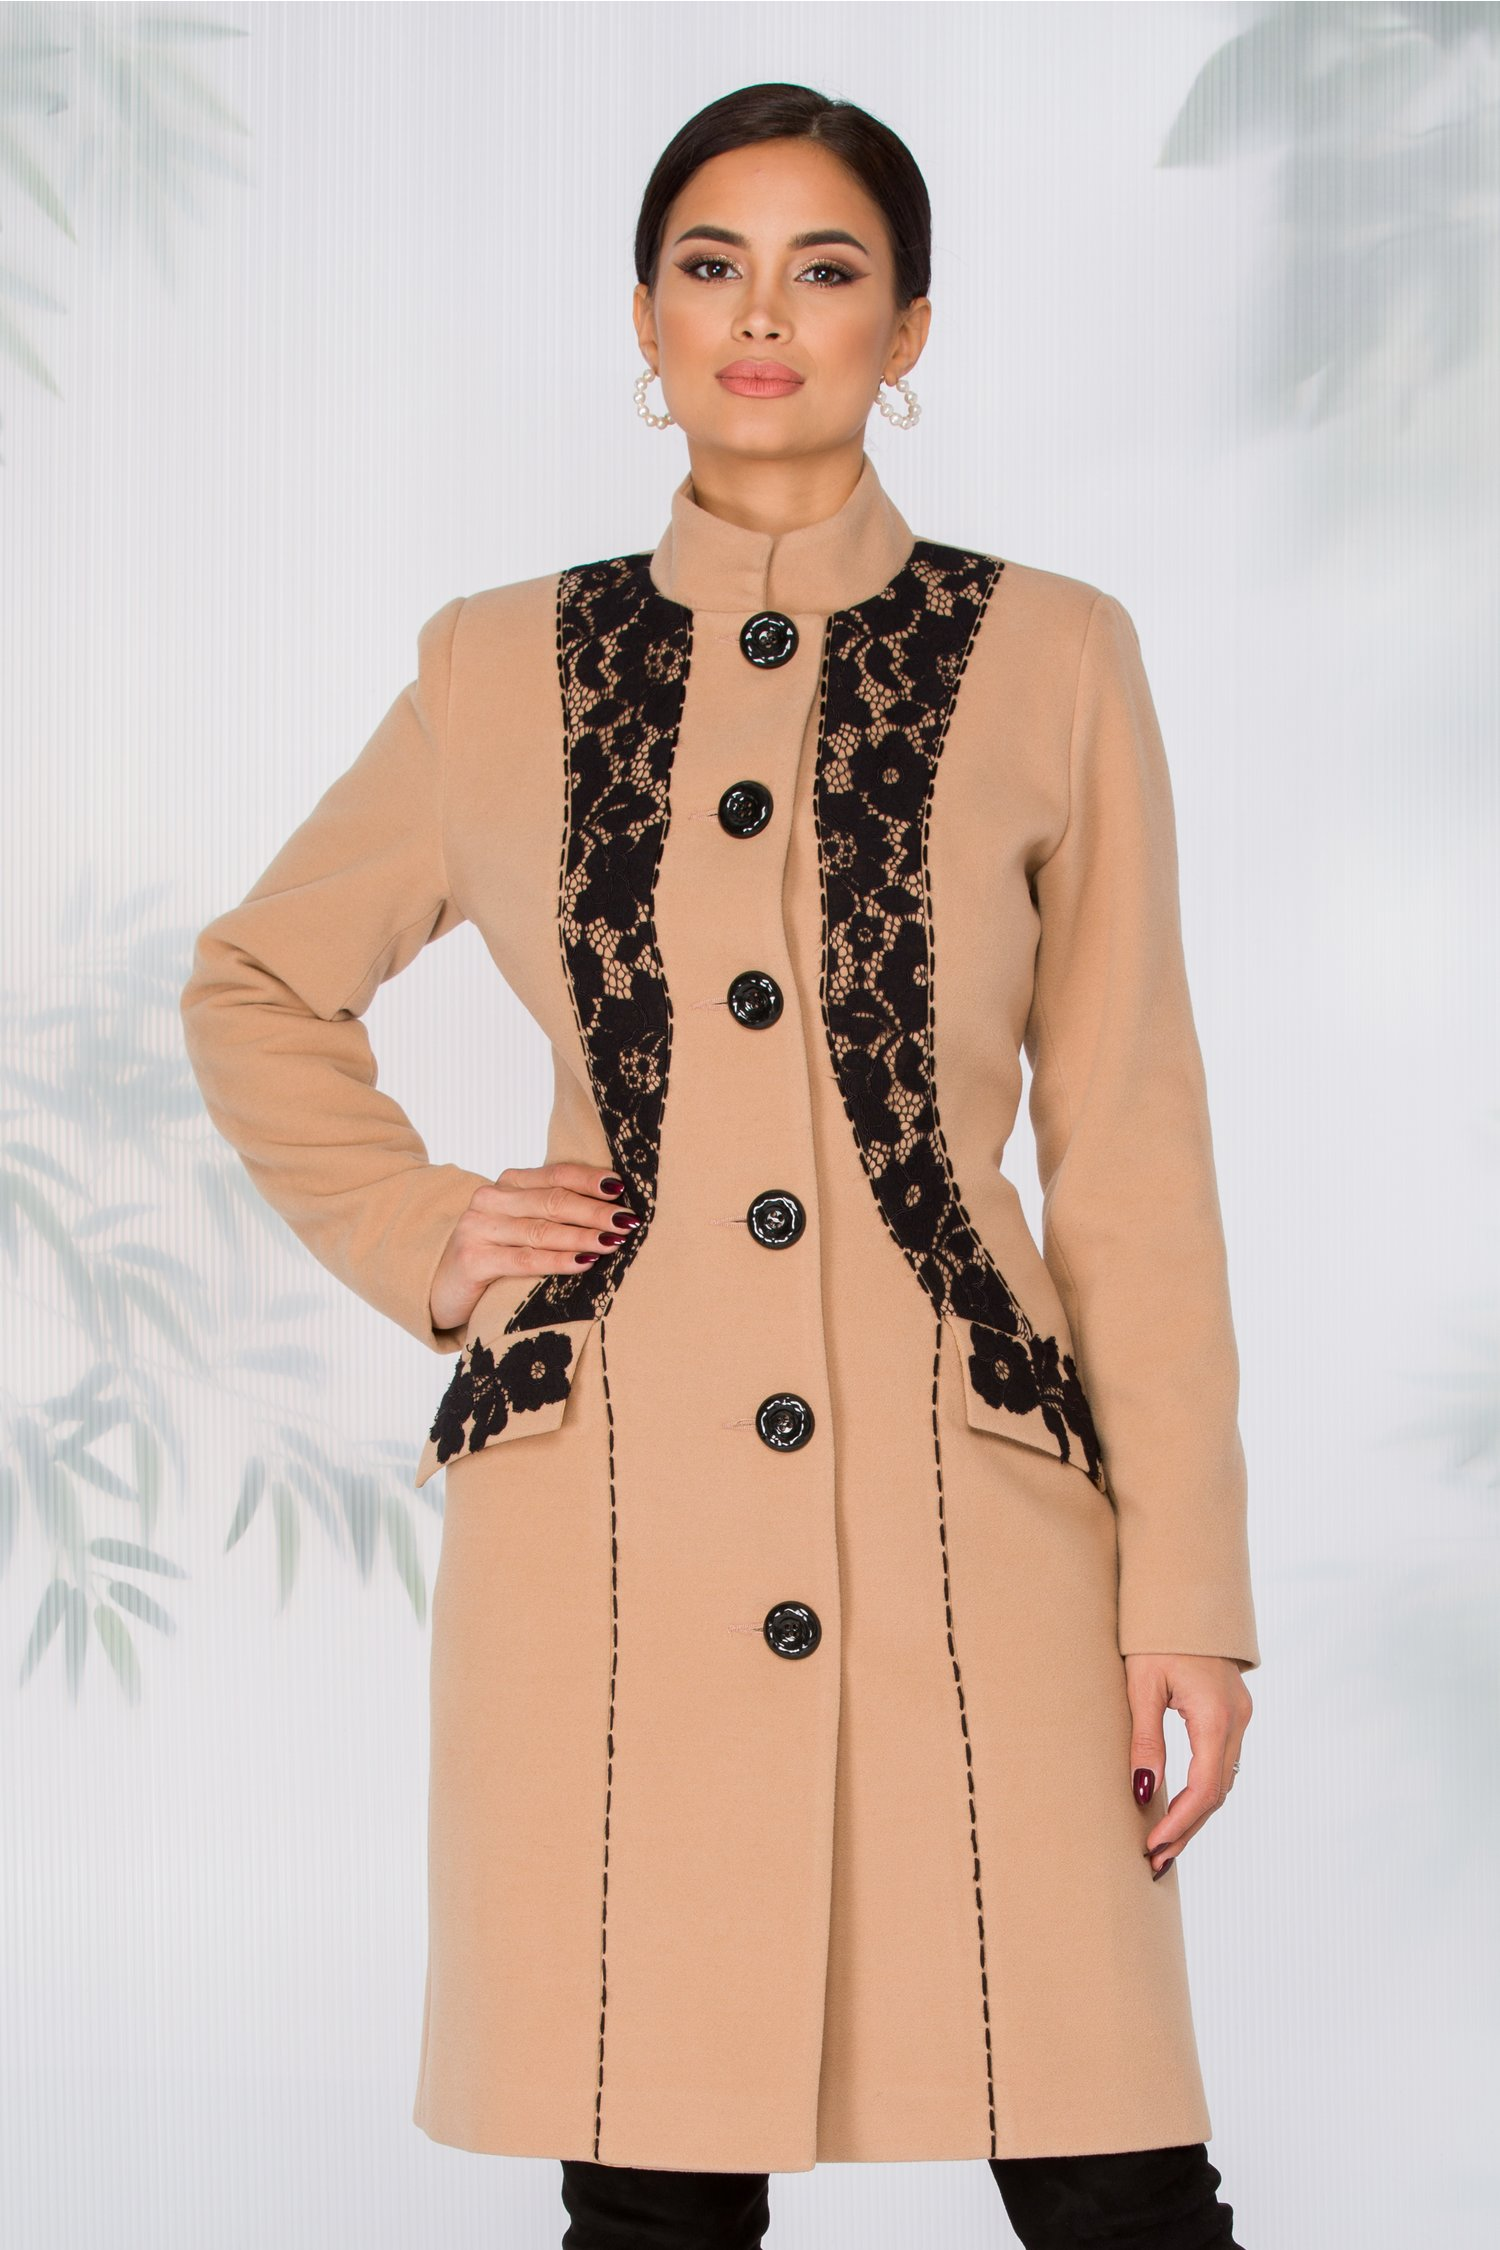 Palton LaDonna bej cu broderie neagra handmade